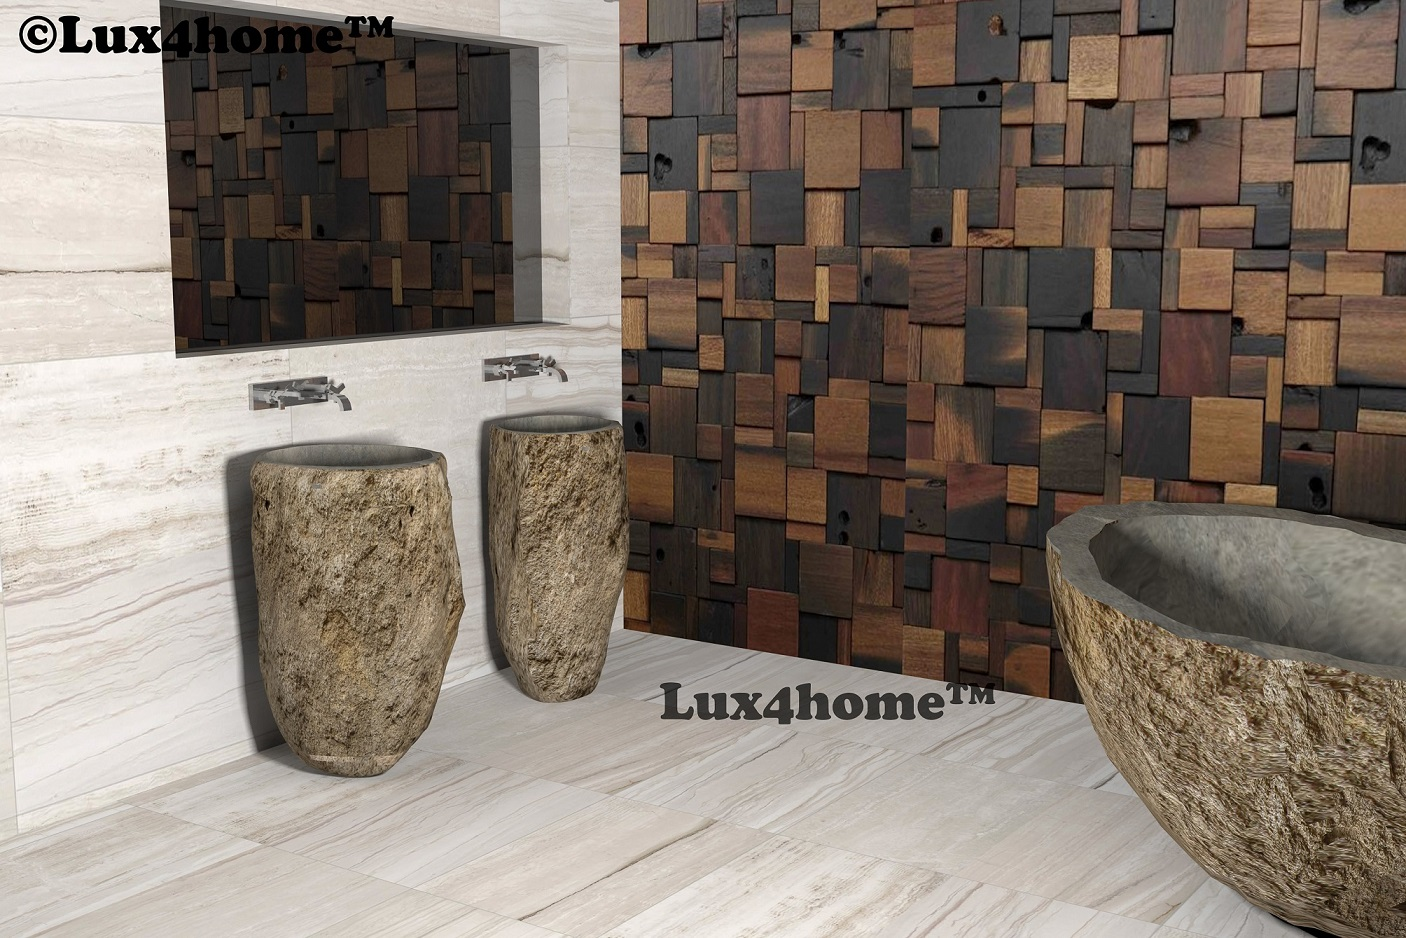 Stone Bathtub Manufacturers Mail: River Stone Bathtub Manufacturer. Lux4home™ Lux4home.com